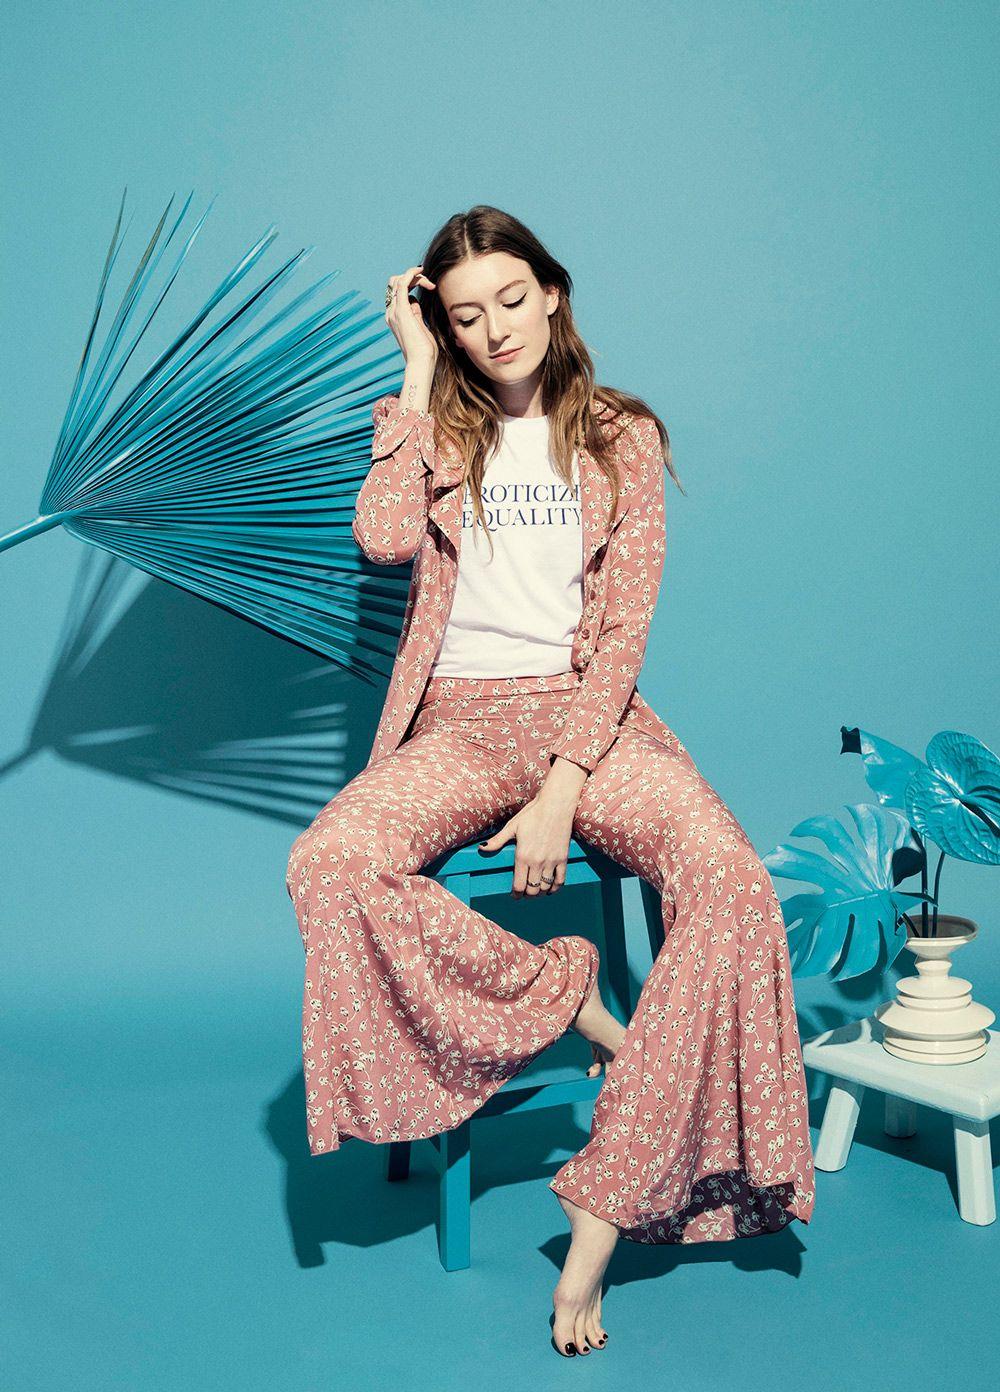 Anna Wolf — Fashion #fashion #fashionphotography #statementstyle #graphictees #tidalmag #florals #bellbottoms #pinkflorals #pinkpants #lesliekirchhoff #editorial